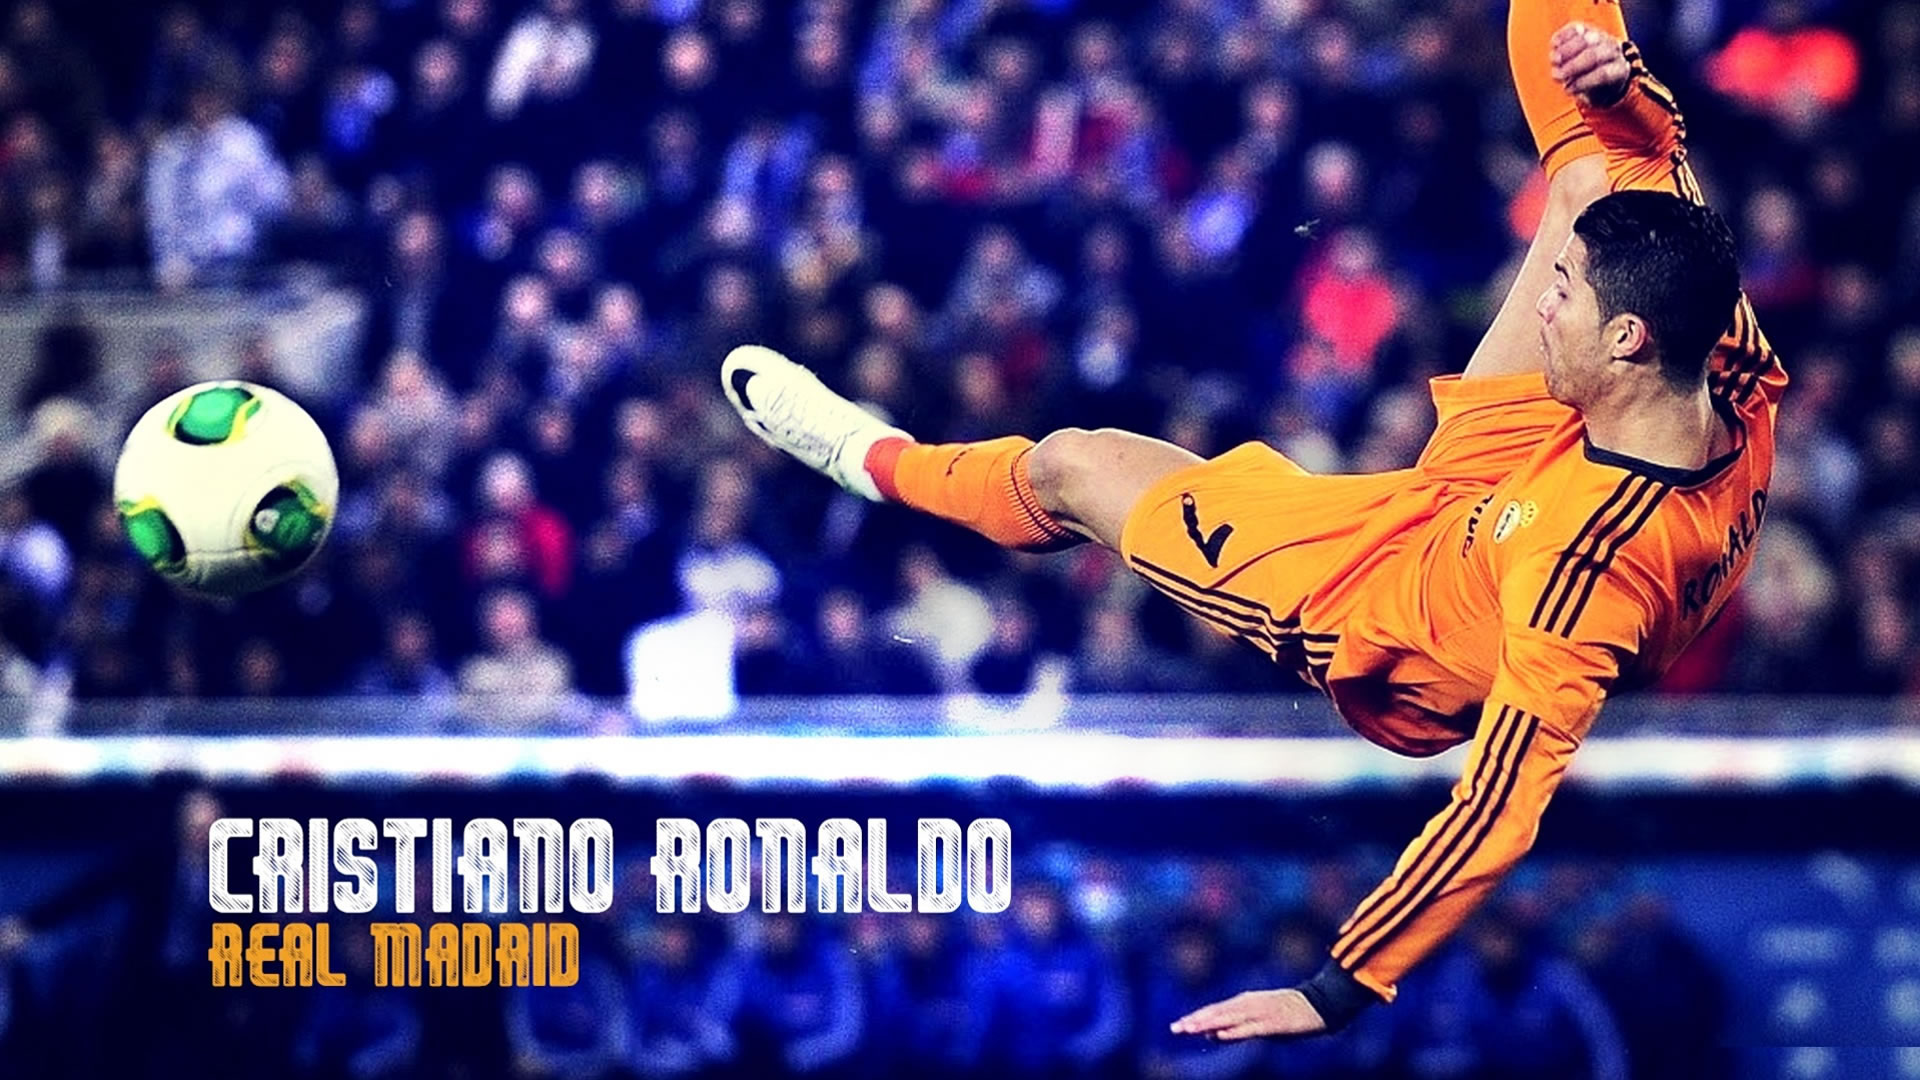 Cristiano Ronaldo bicycle kick wallpaper